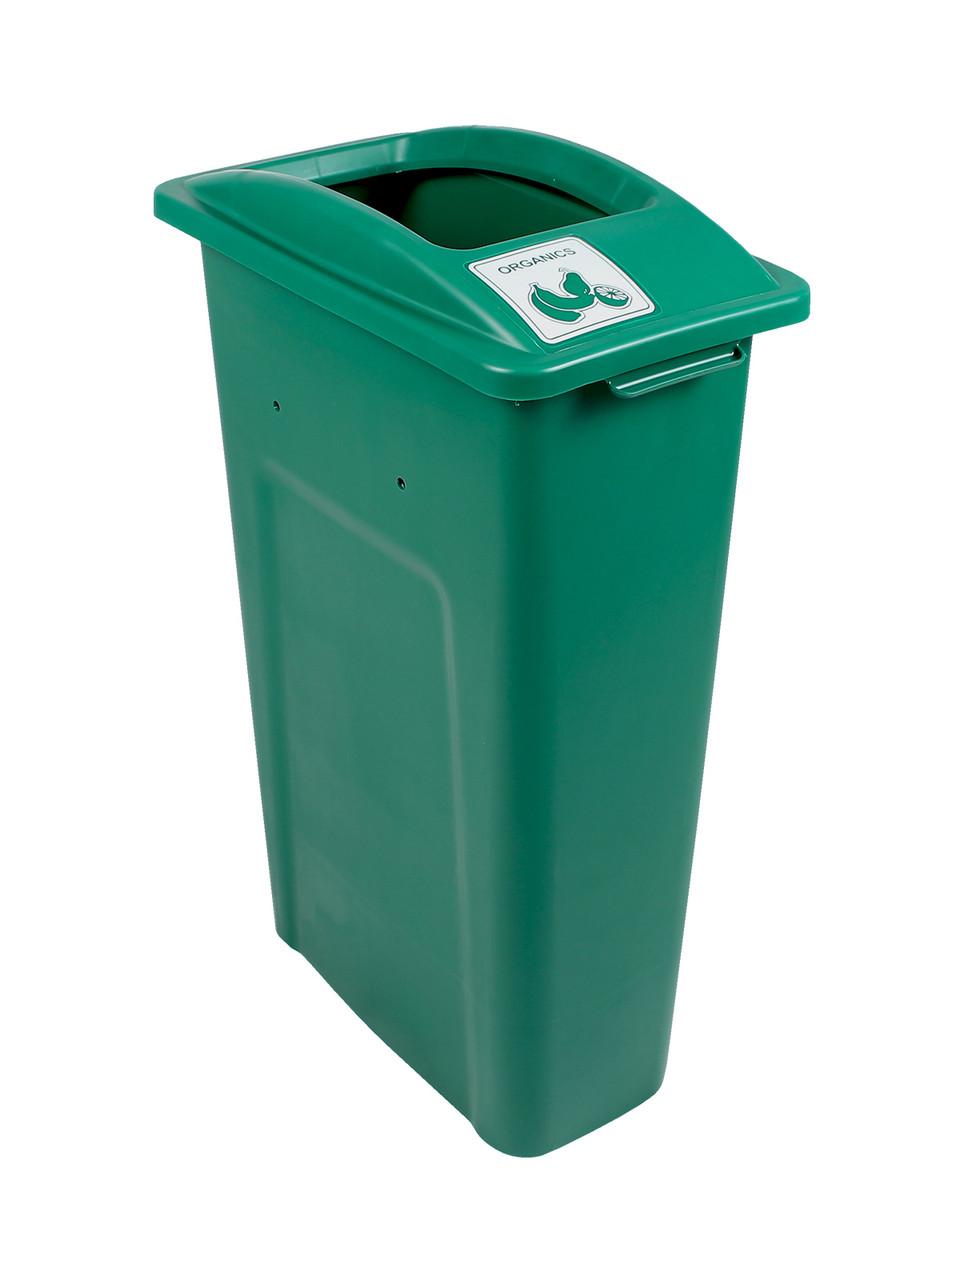 23 Gallon Green Skinny Simple Sort Compost Bin (Organics, Open Top)